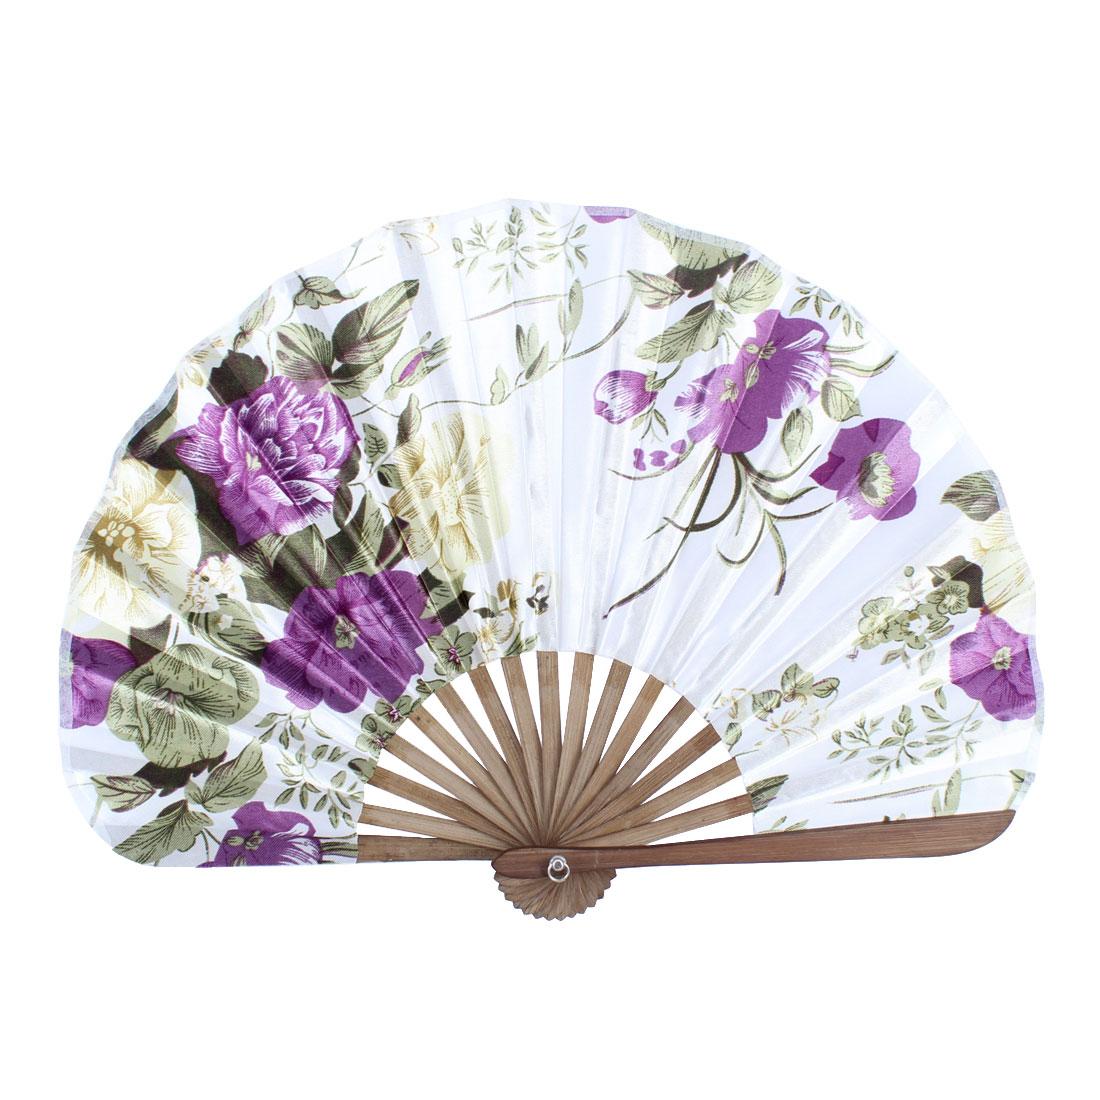 Wood Ribs Seashell Shape Flower Printed Folding Hand Fan White Purple